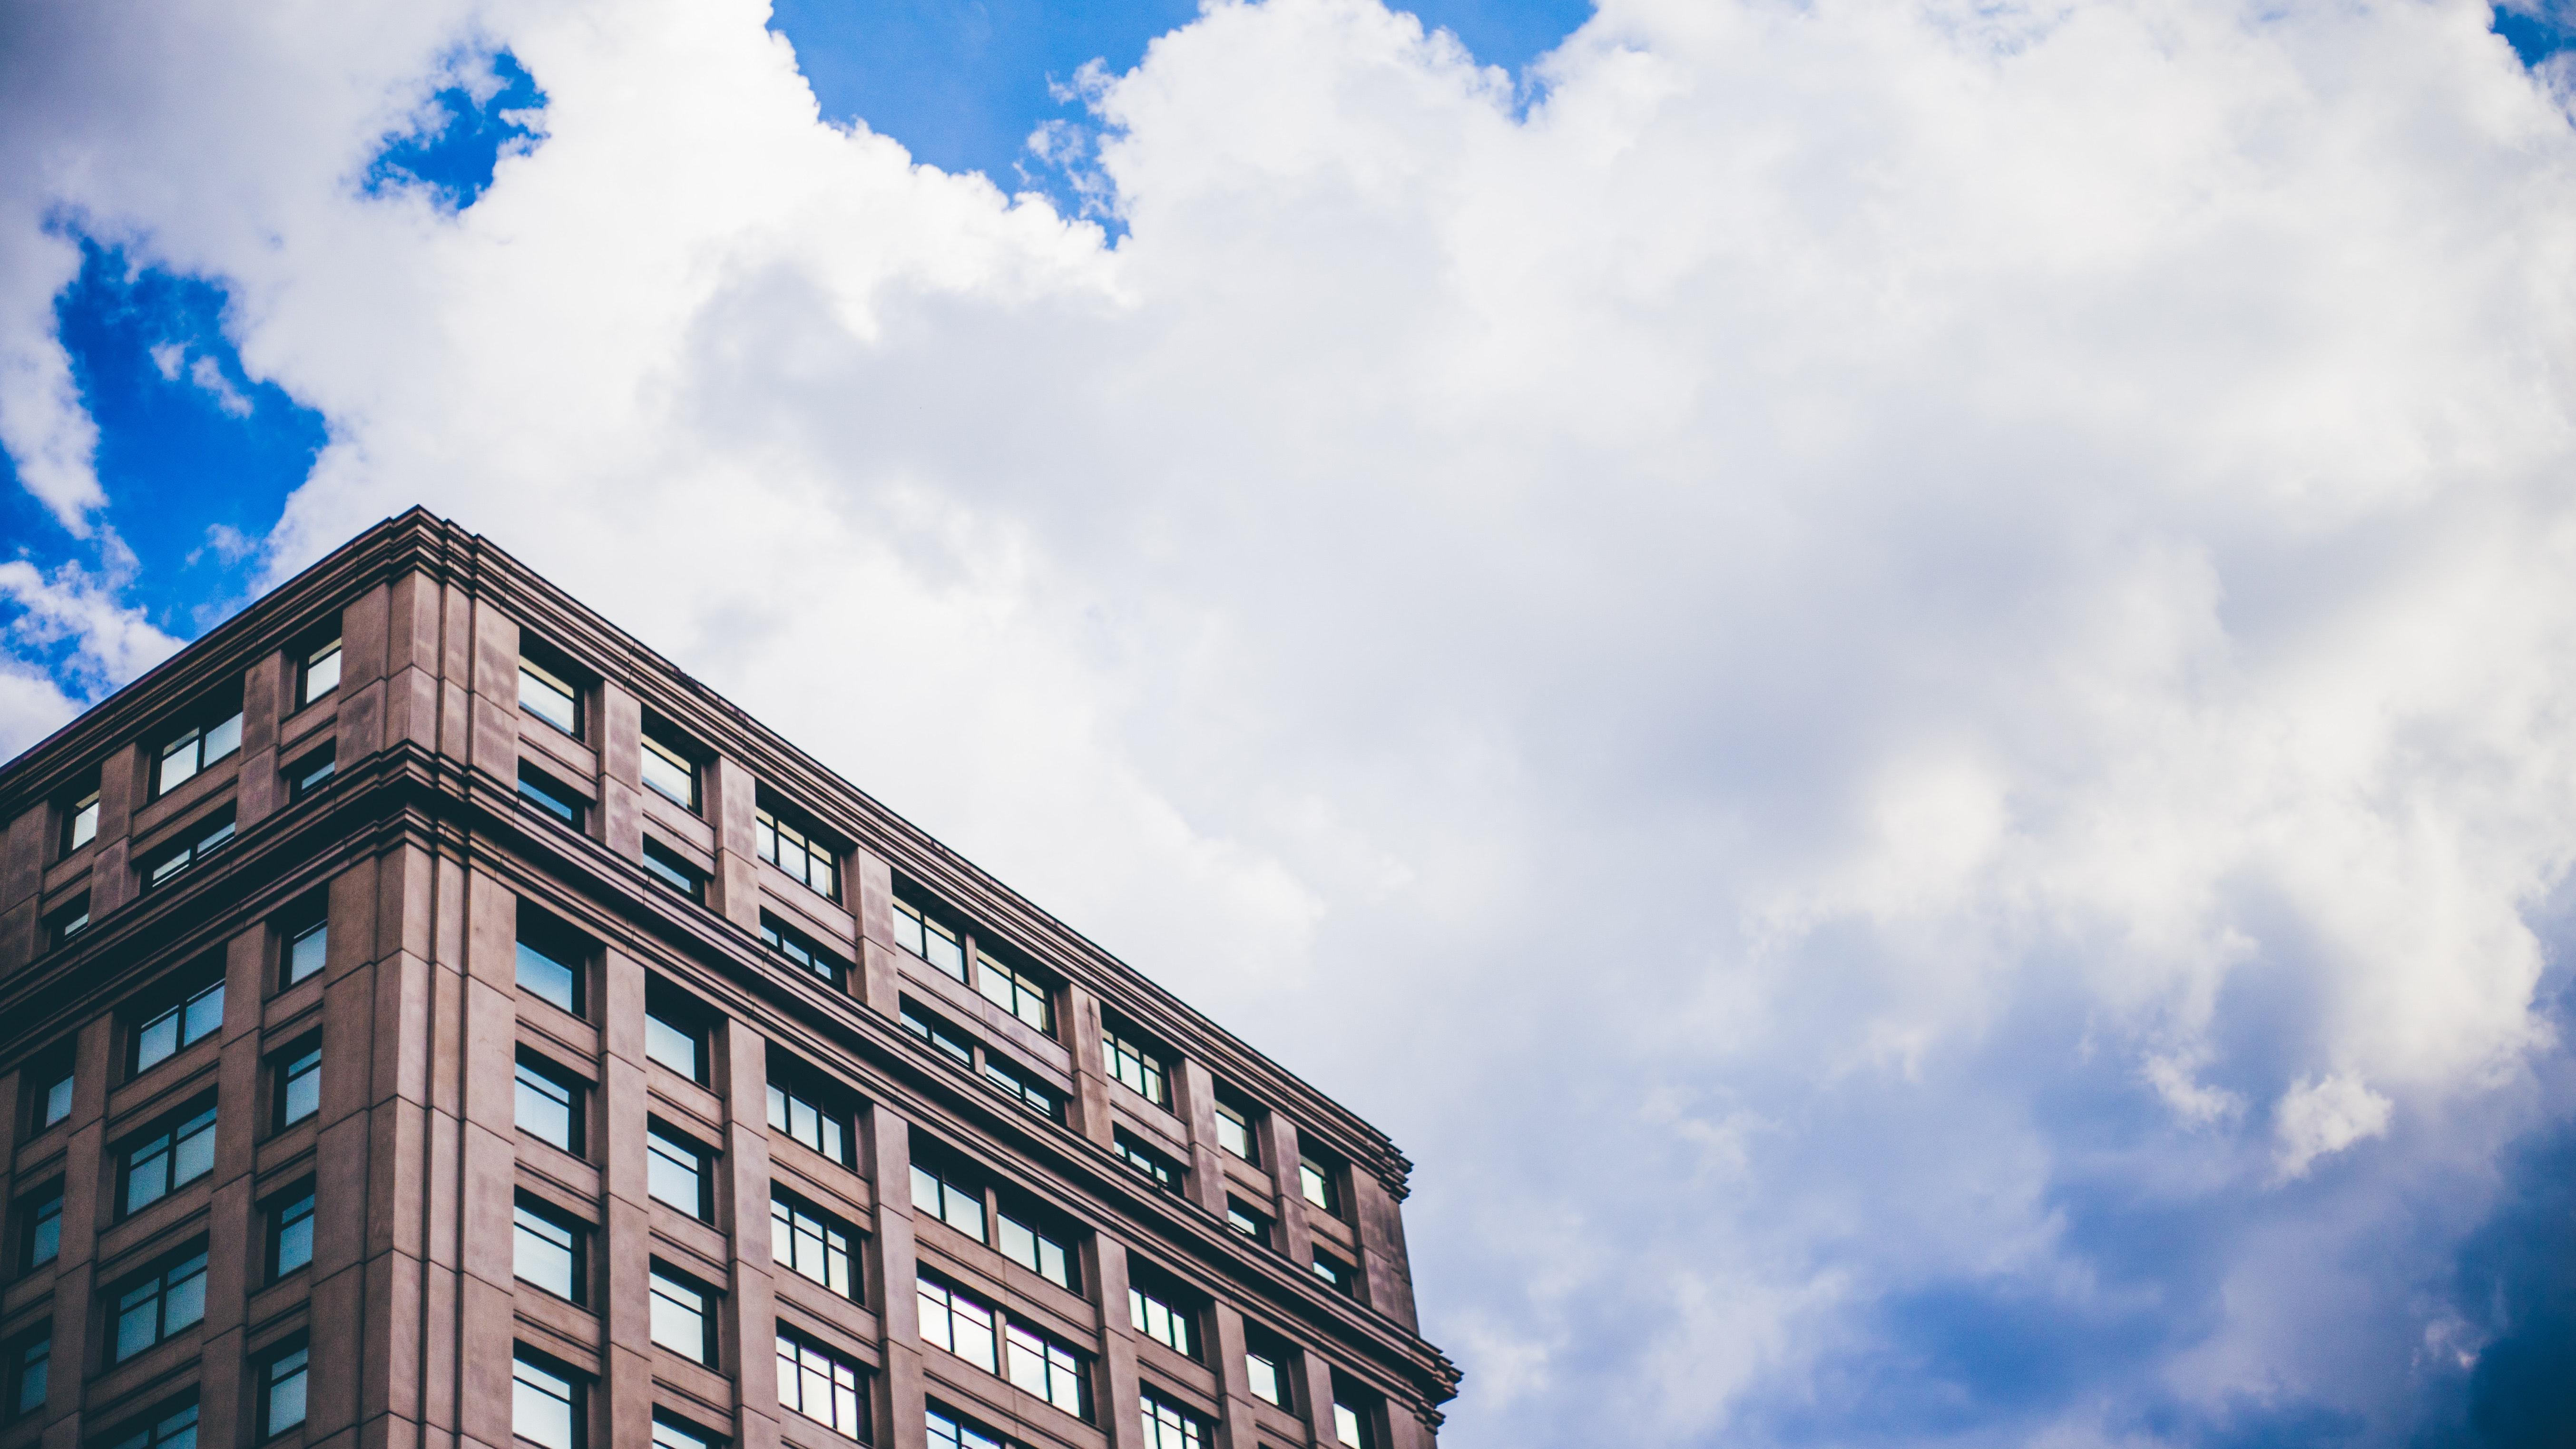 architecture-building-clouds-38197